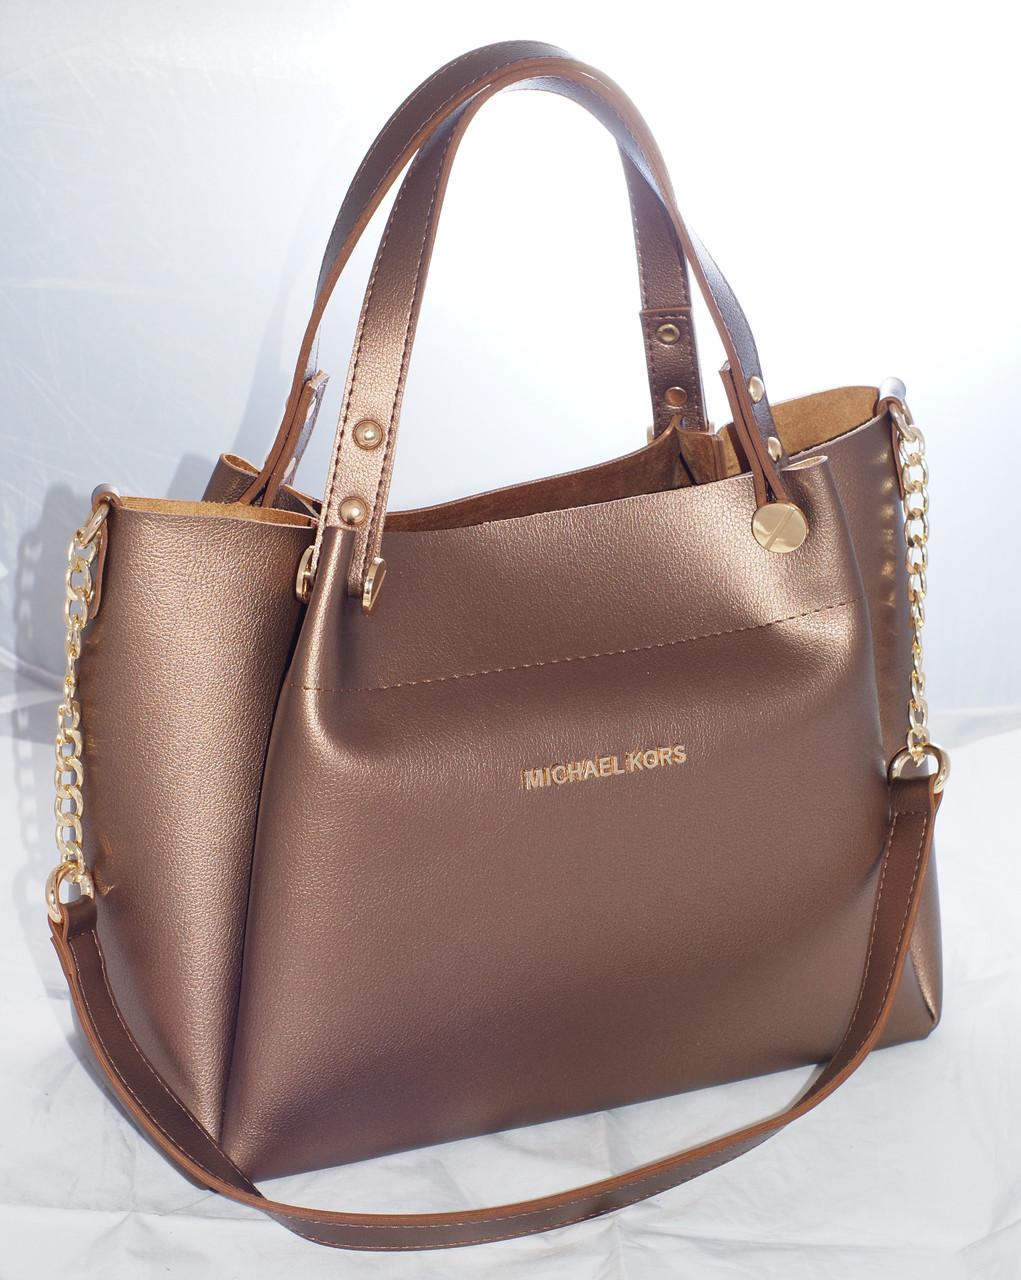 35f1bb64f8e0 Женская сумка Michael Kors (Майкл Корс), коричневая - Интернет-магазин